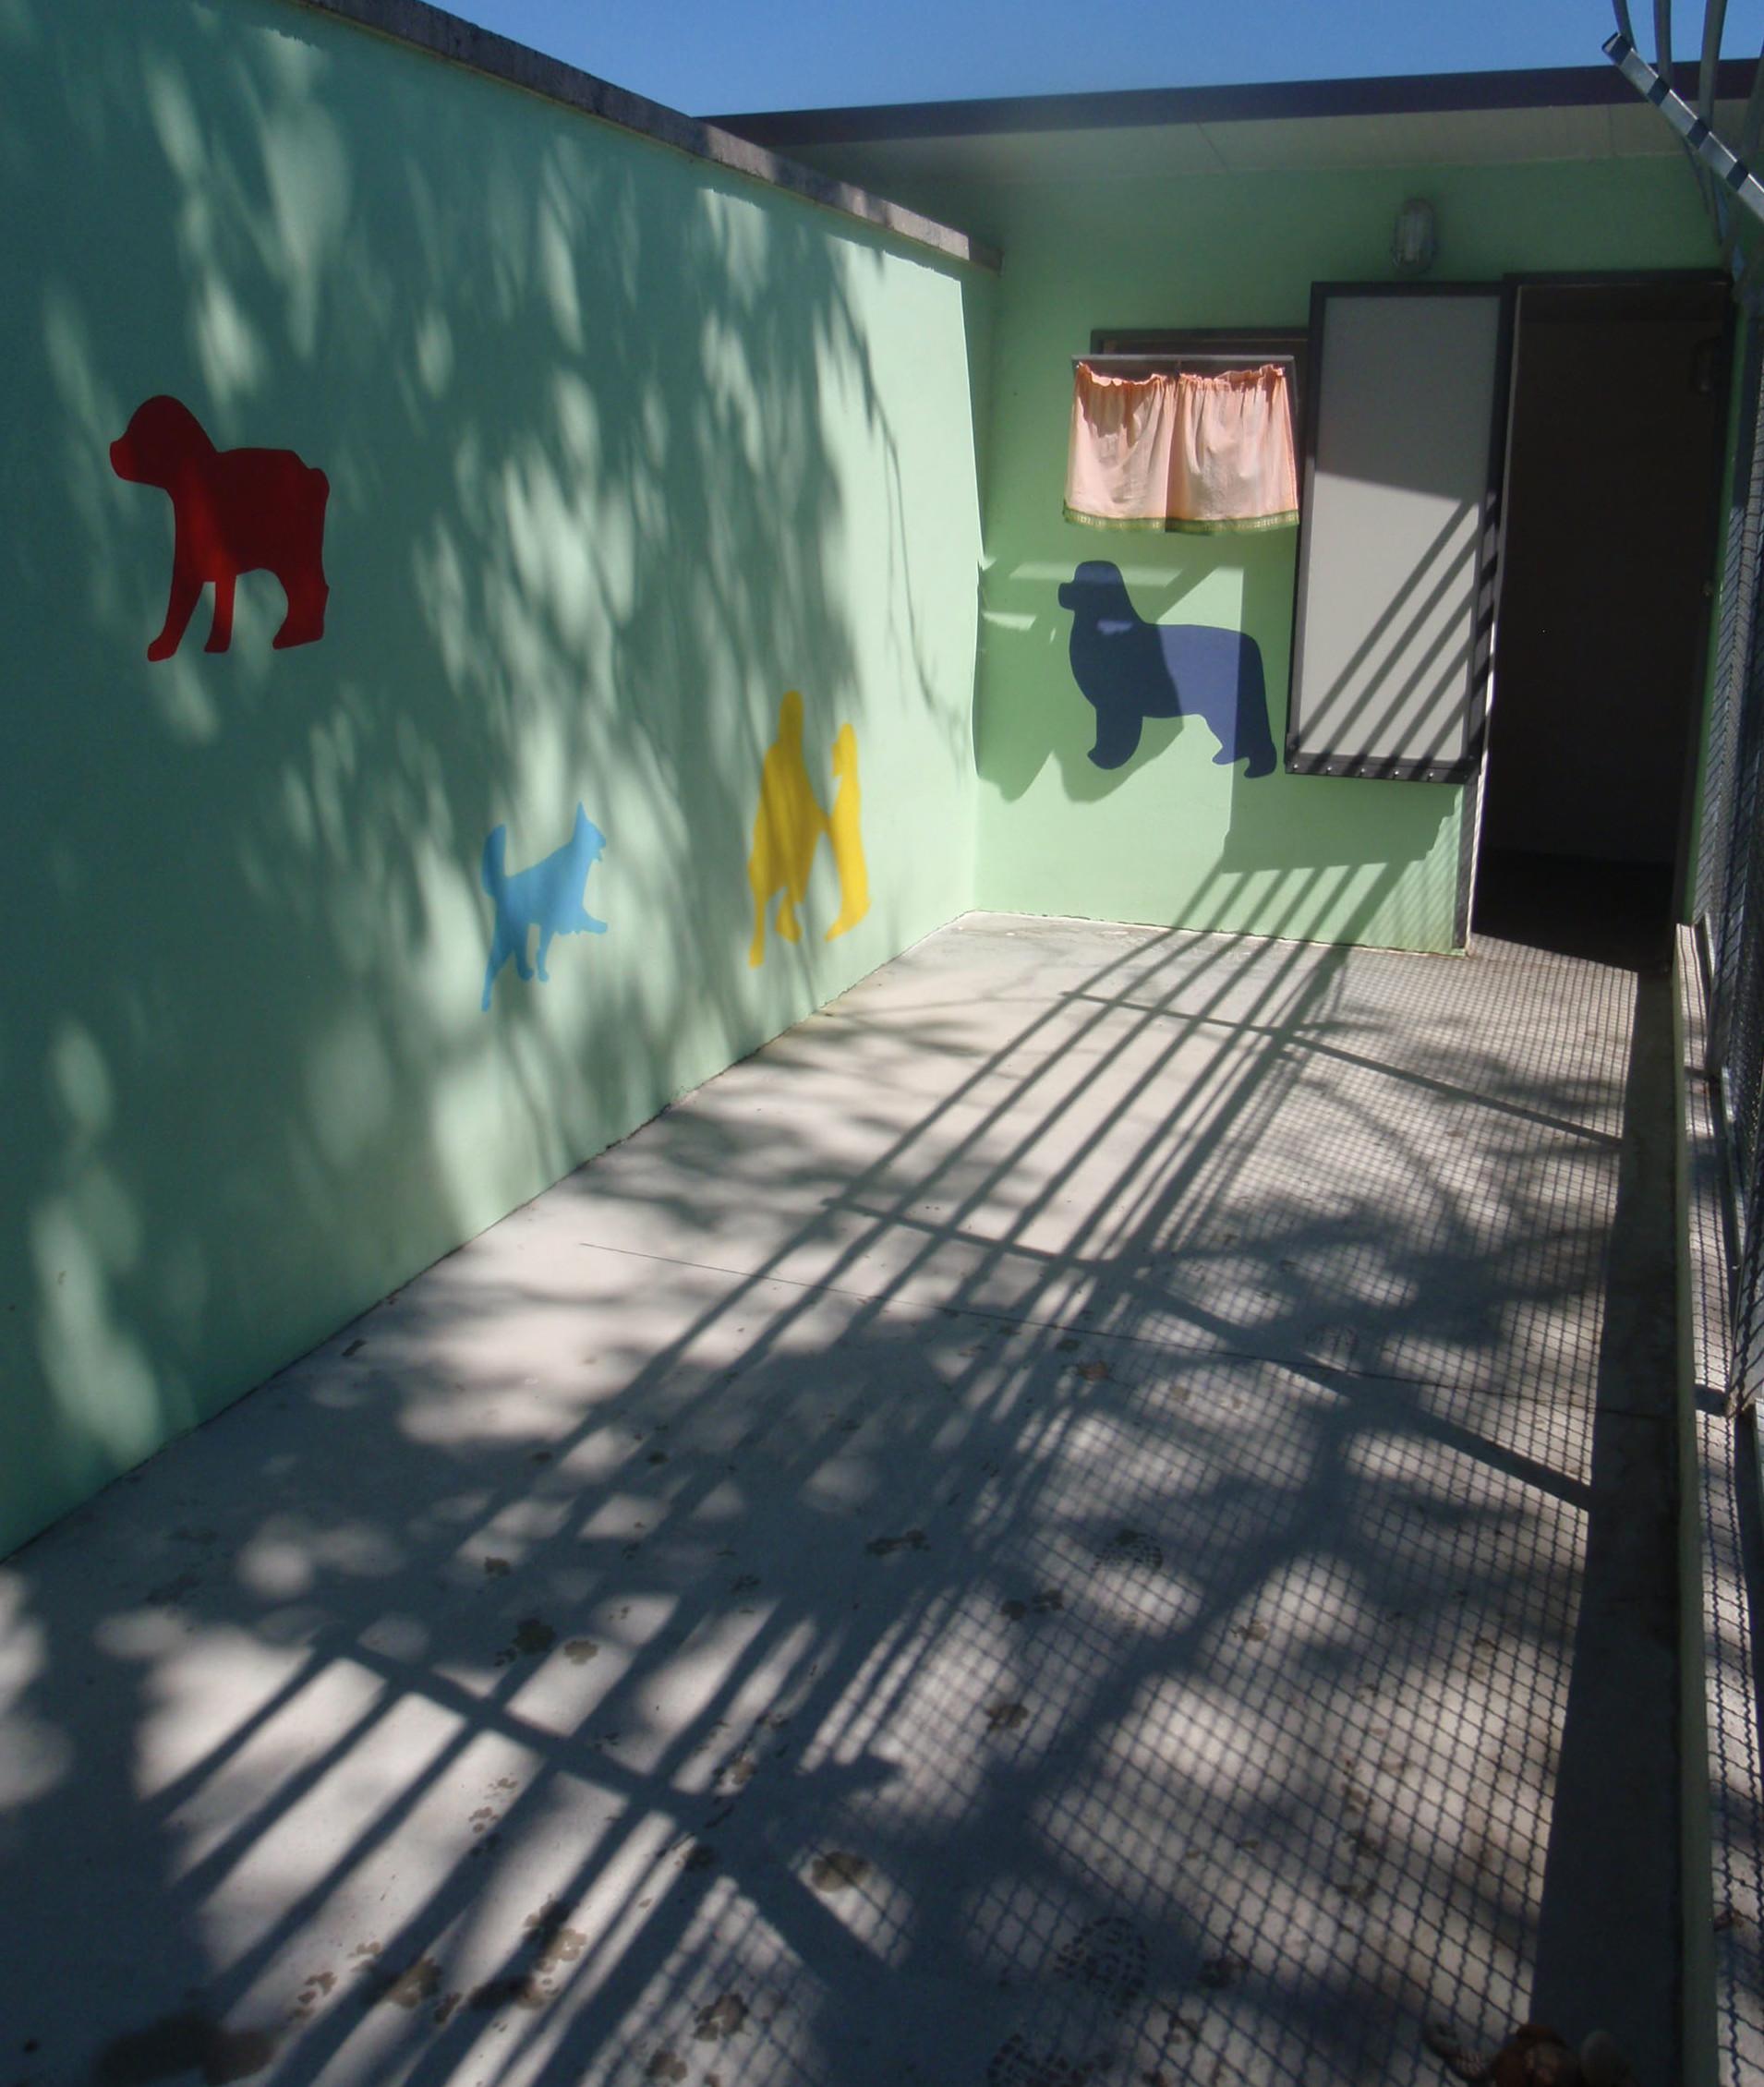 Albergo_Pensione_-cani_Bauhaus_02-e1397809842639